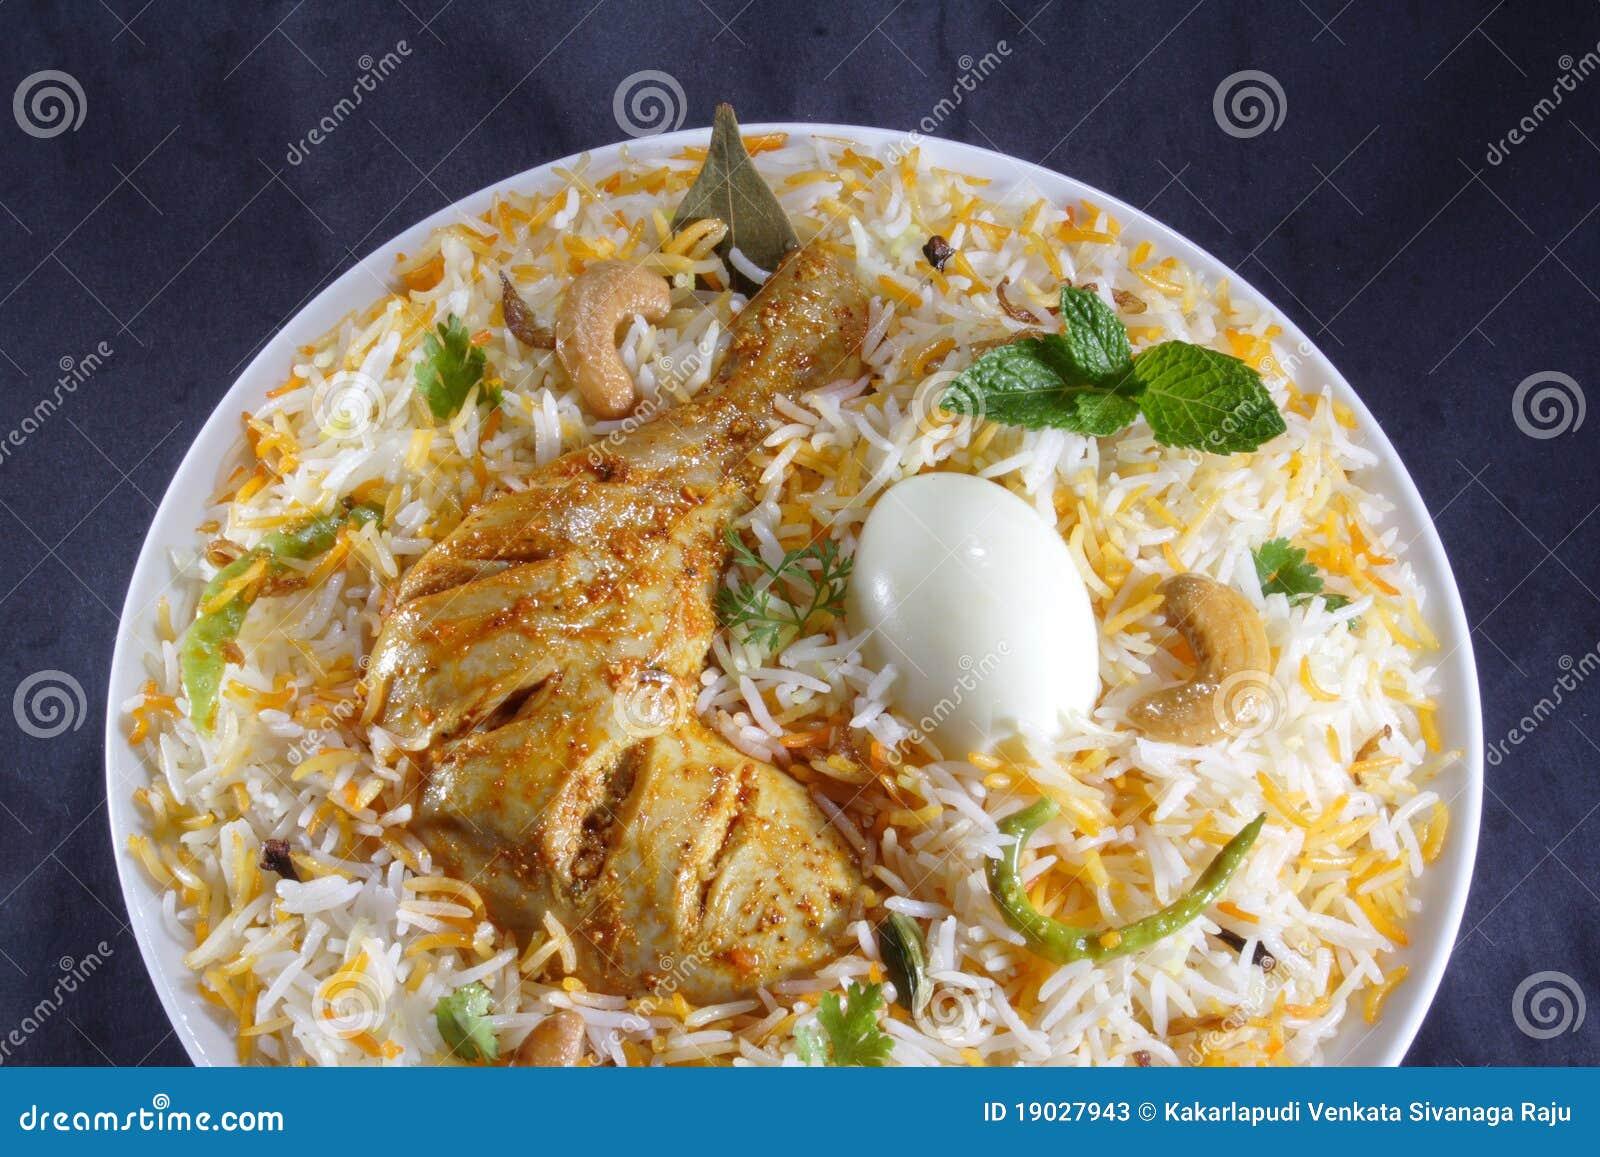 Chicken Biryani Recipe In Hindi Pdf